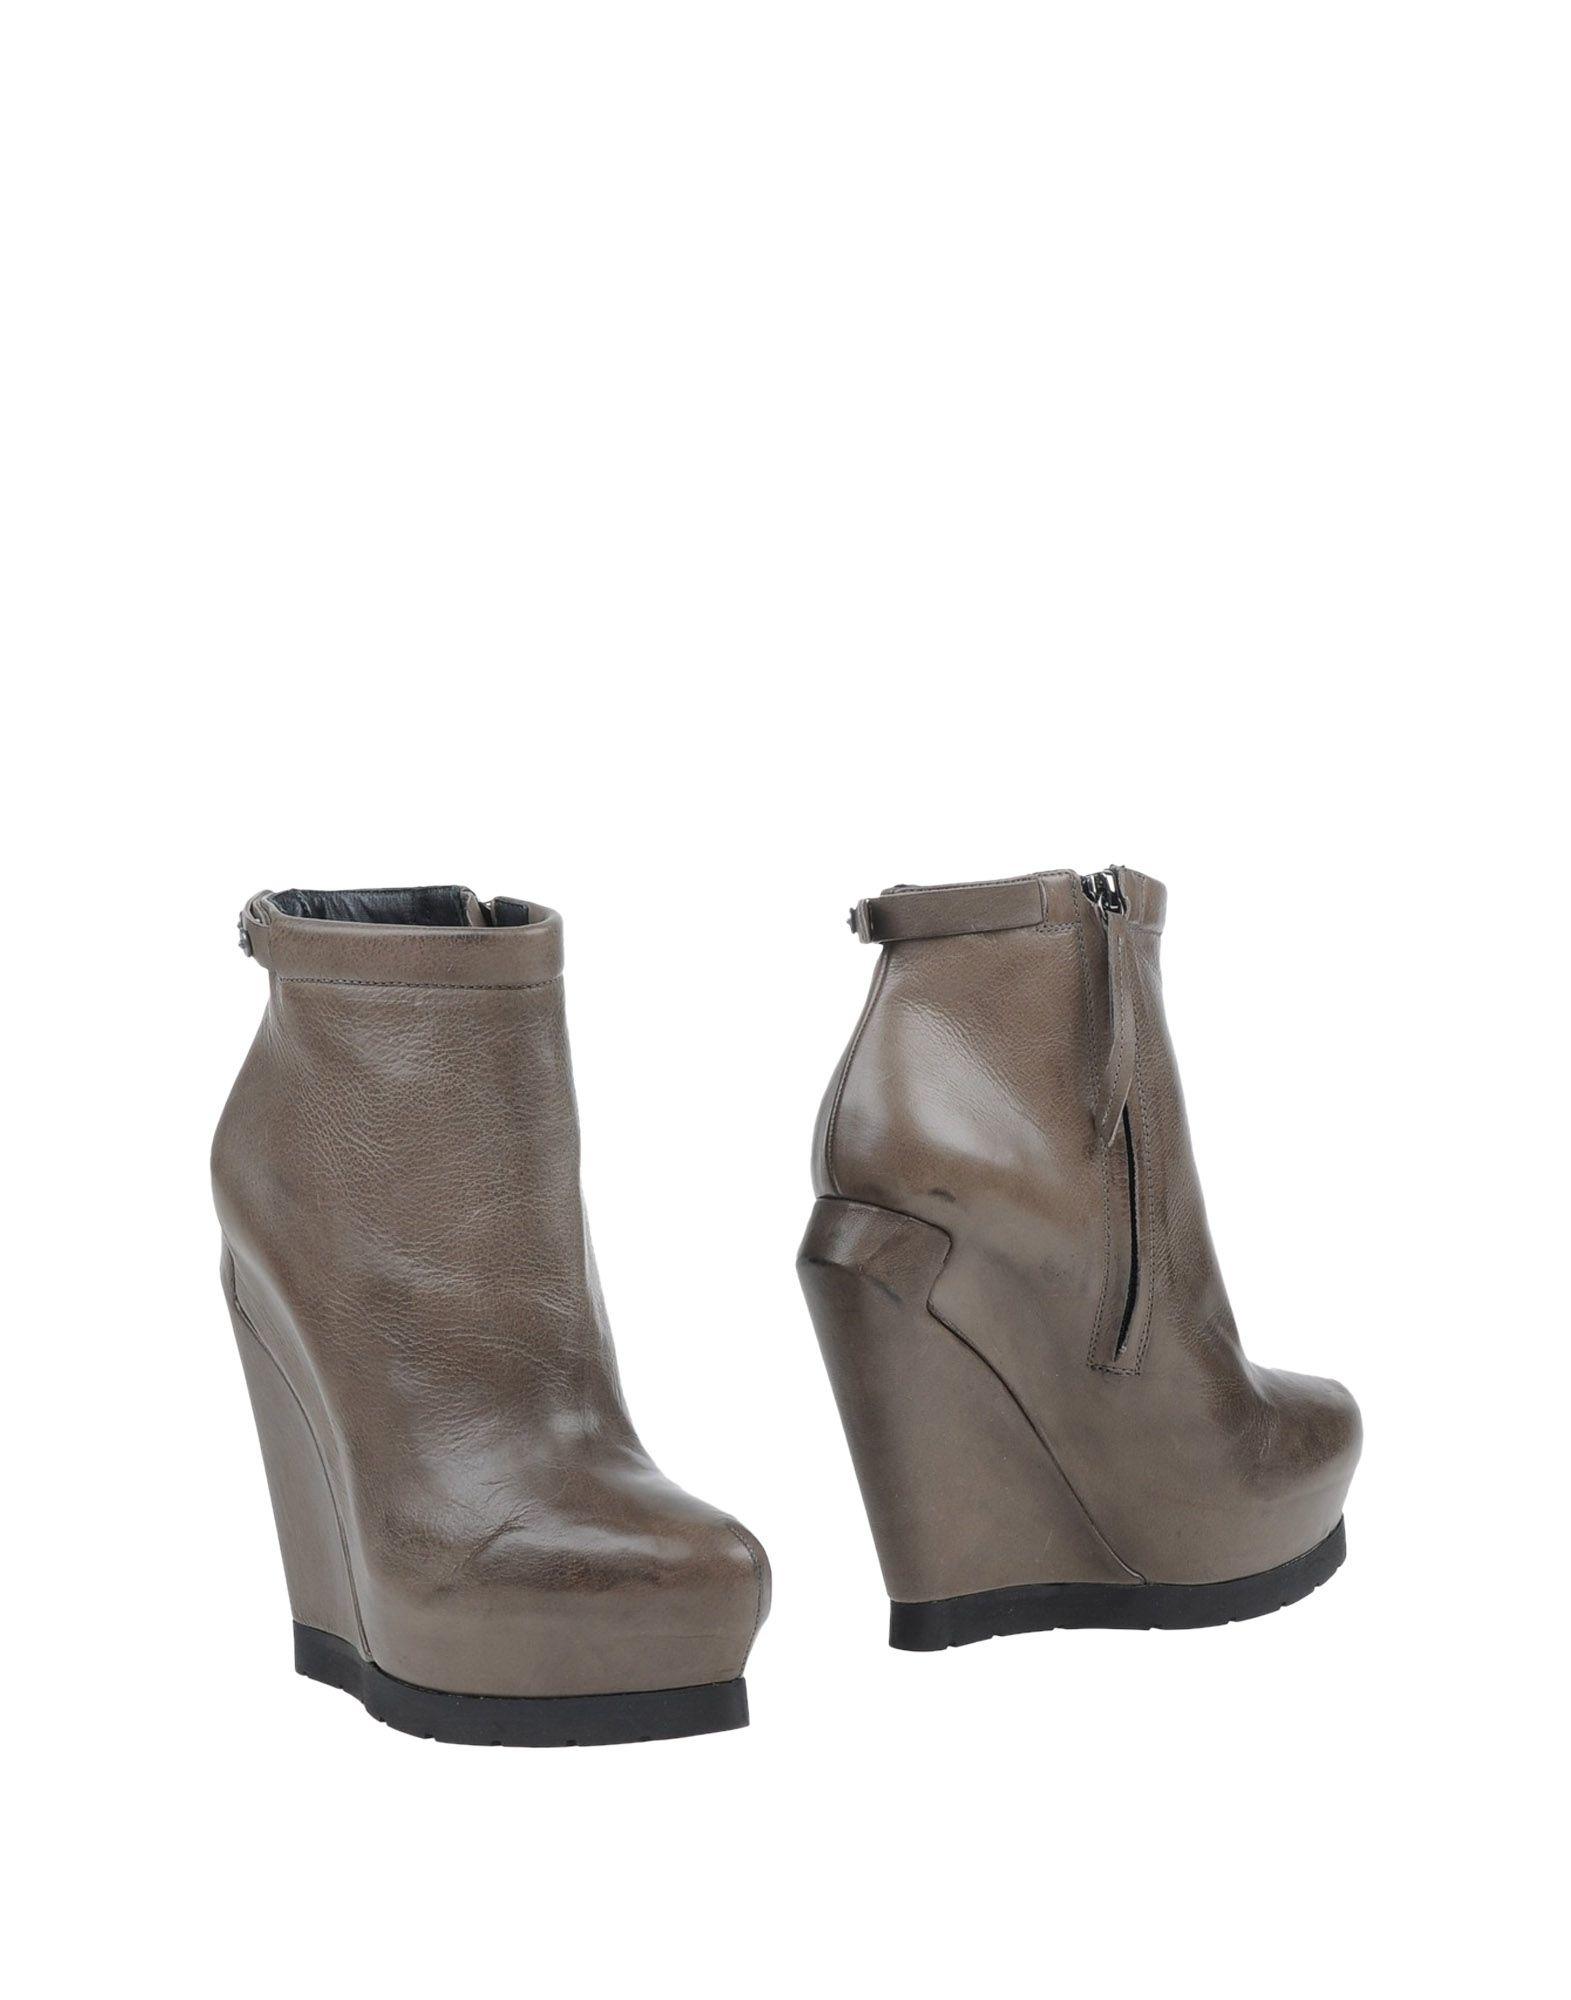 Cinzia Araia Ankle Boots In Green Lyst